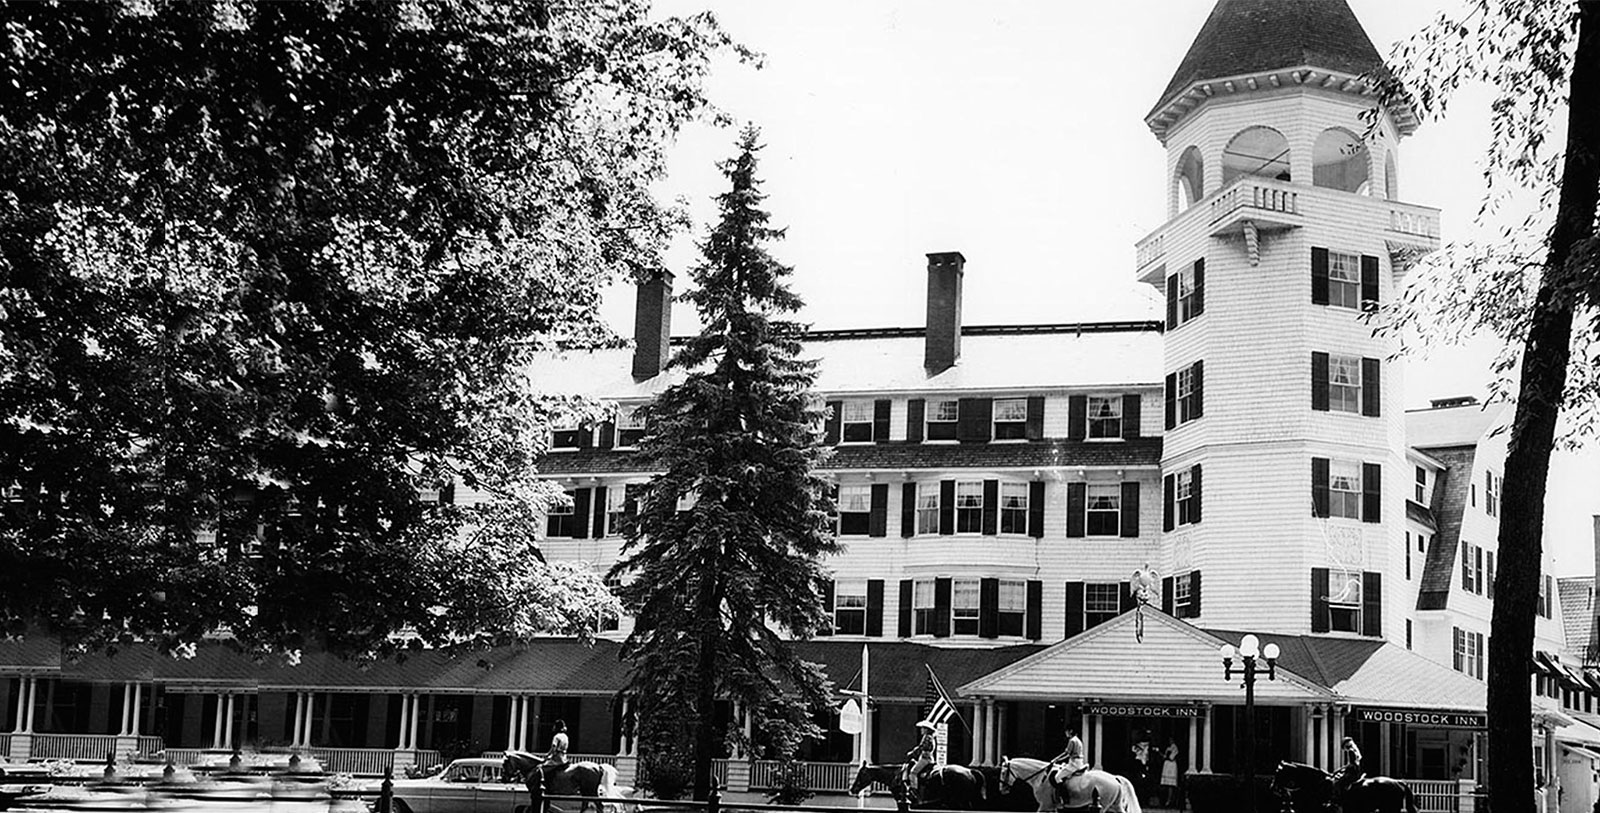 Historic image of Woodstock Inn & Resort, 1793, Member of Historic Hotels of America, in Woodstock, Vermont, Discover